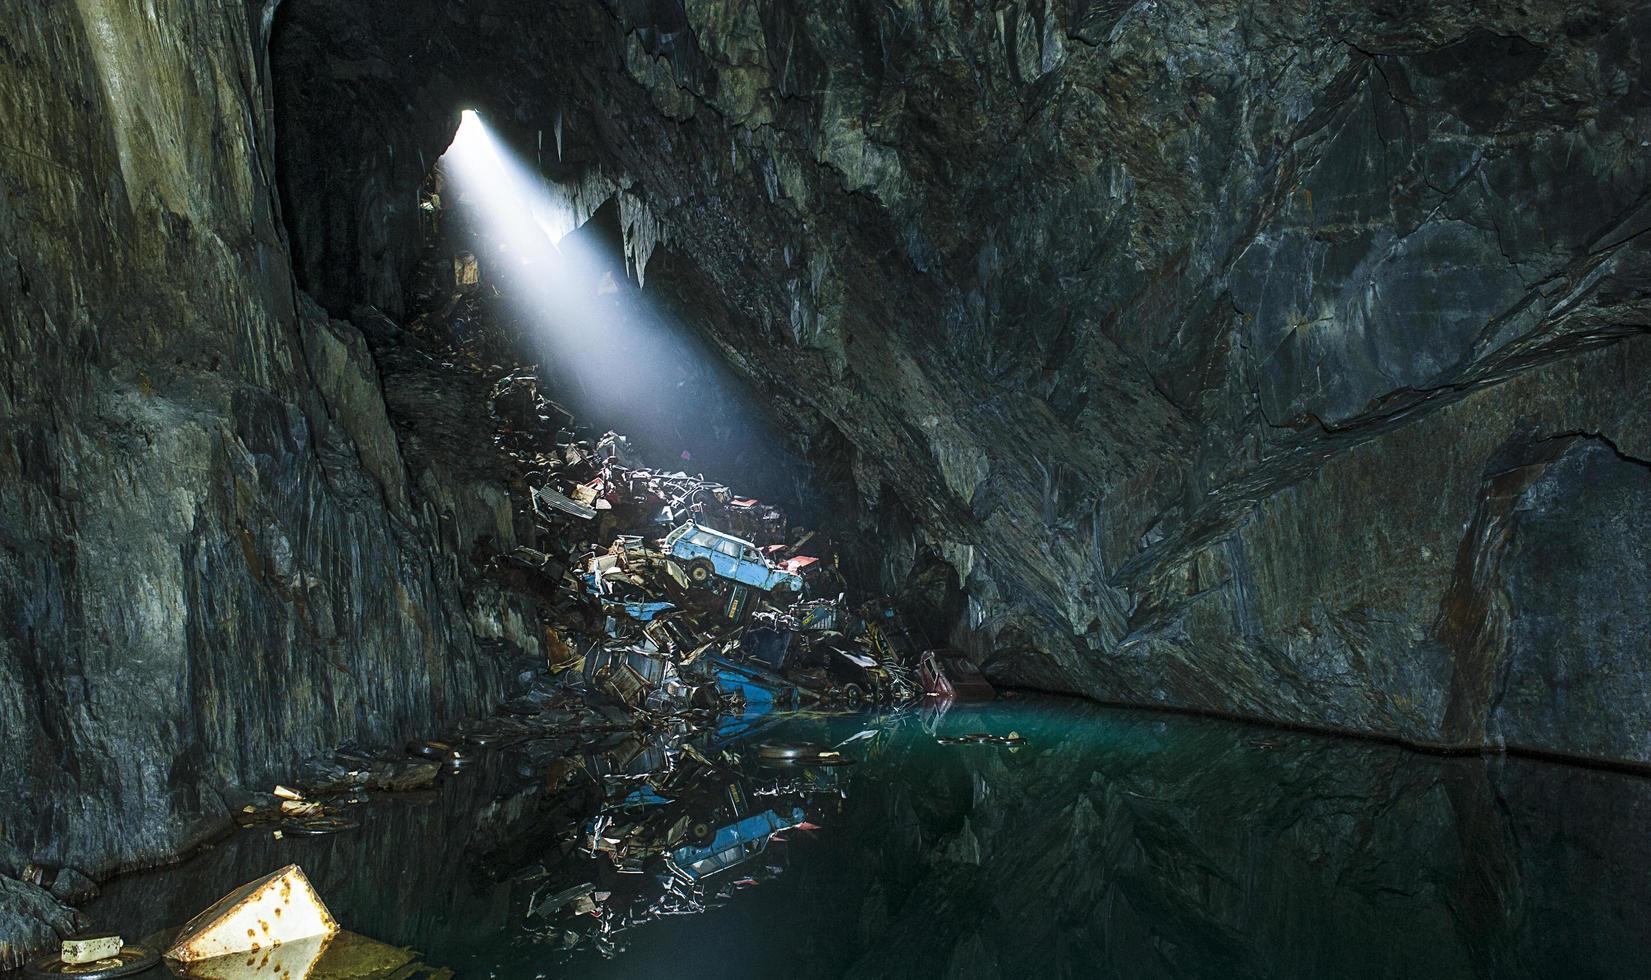 Light shining through a cave photo